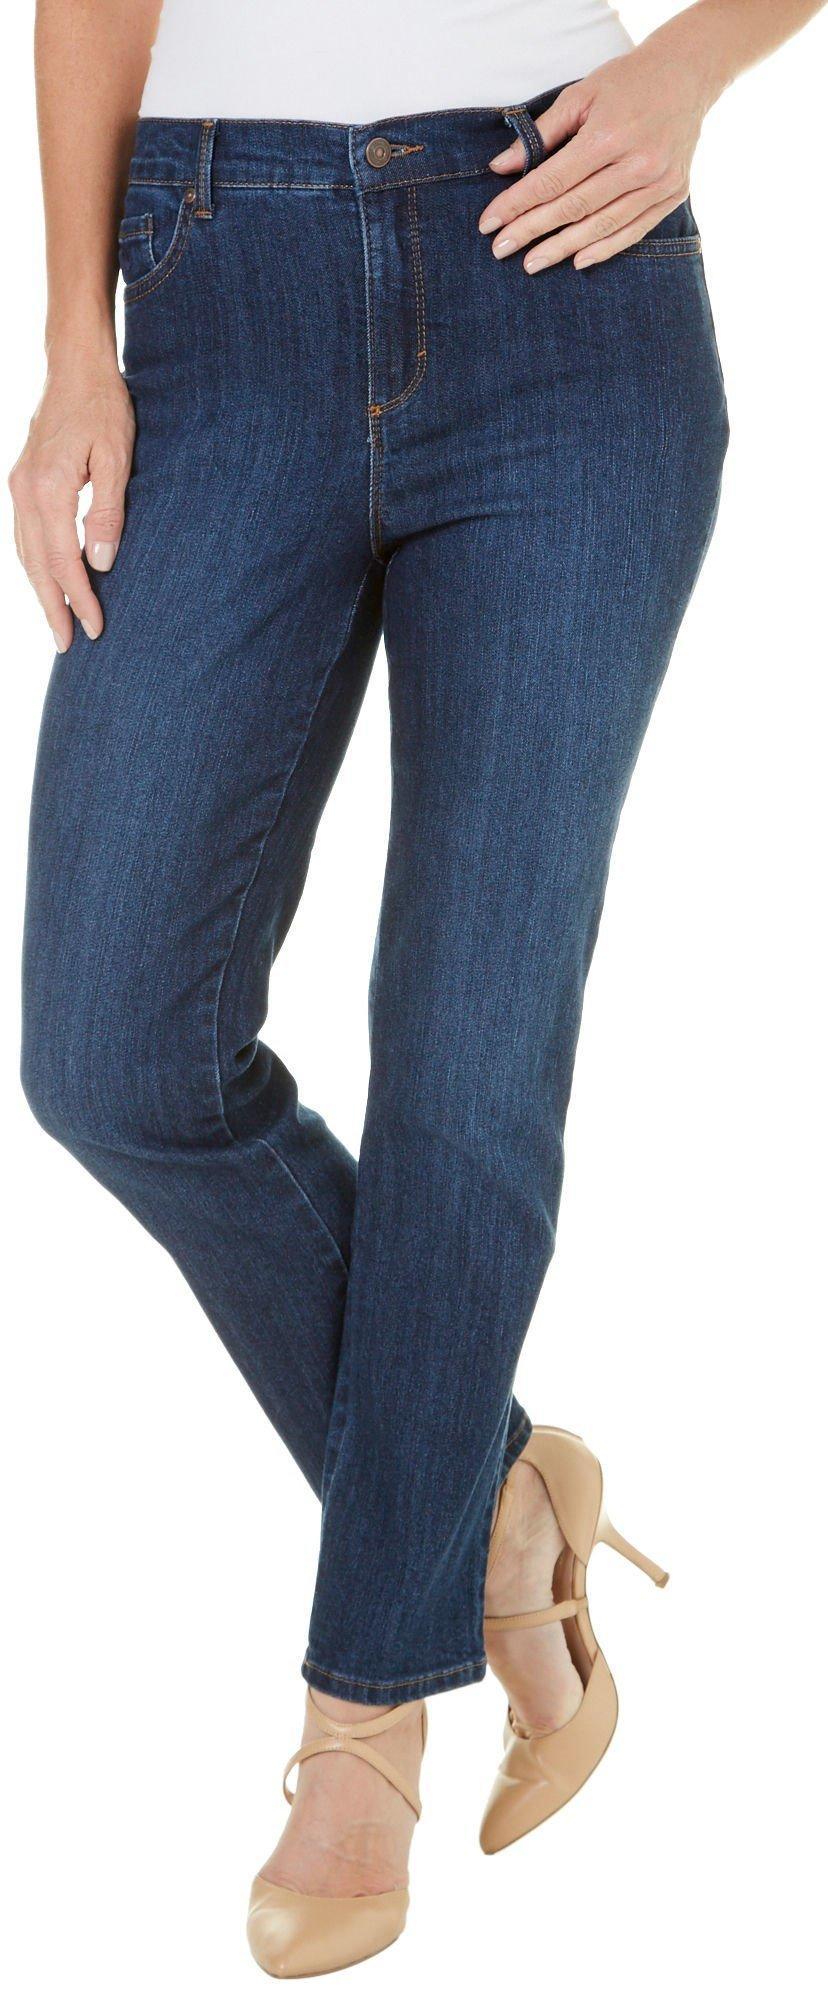 Gloria Vanderbilt AMANDA Scottsdale Blue Wash Original Slimming Jeans 24 NEW!